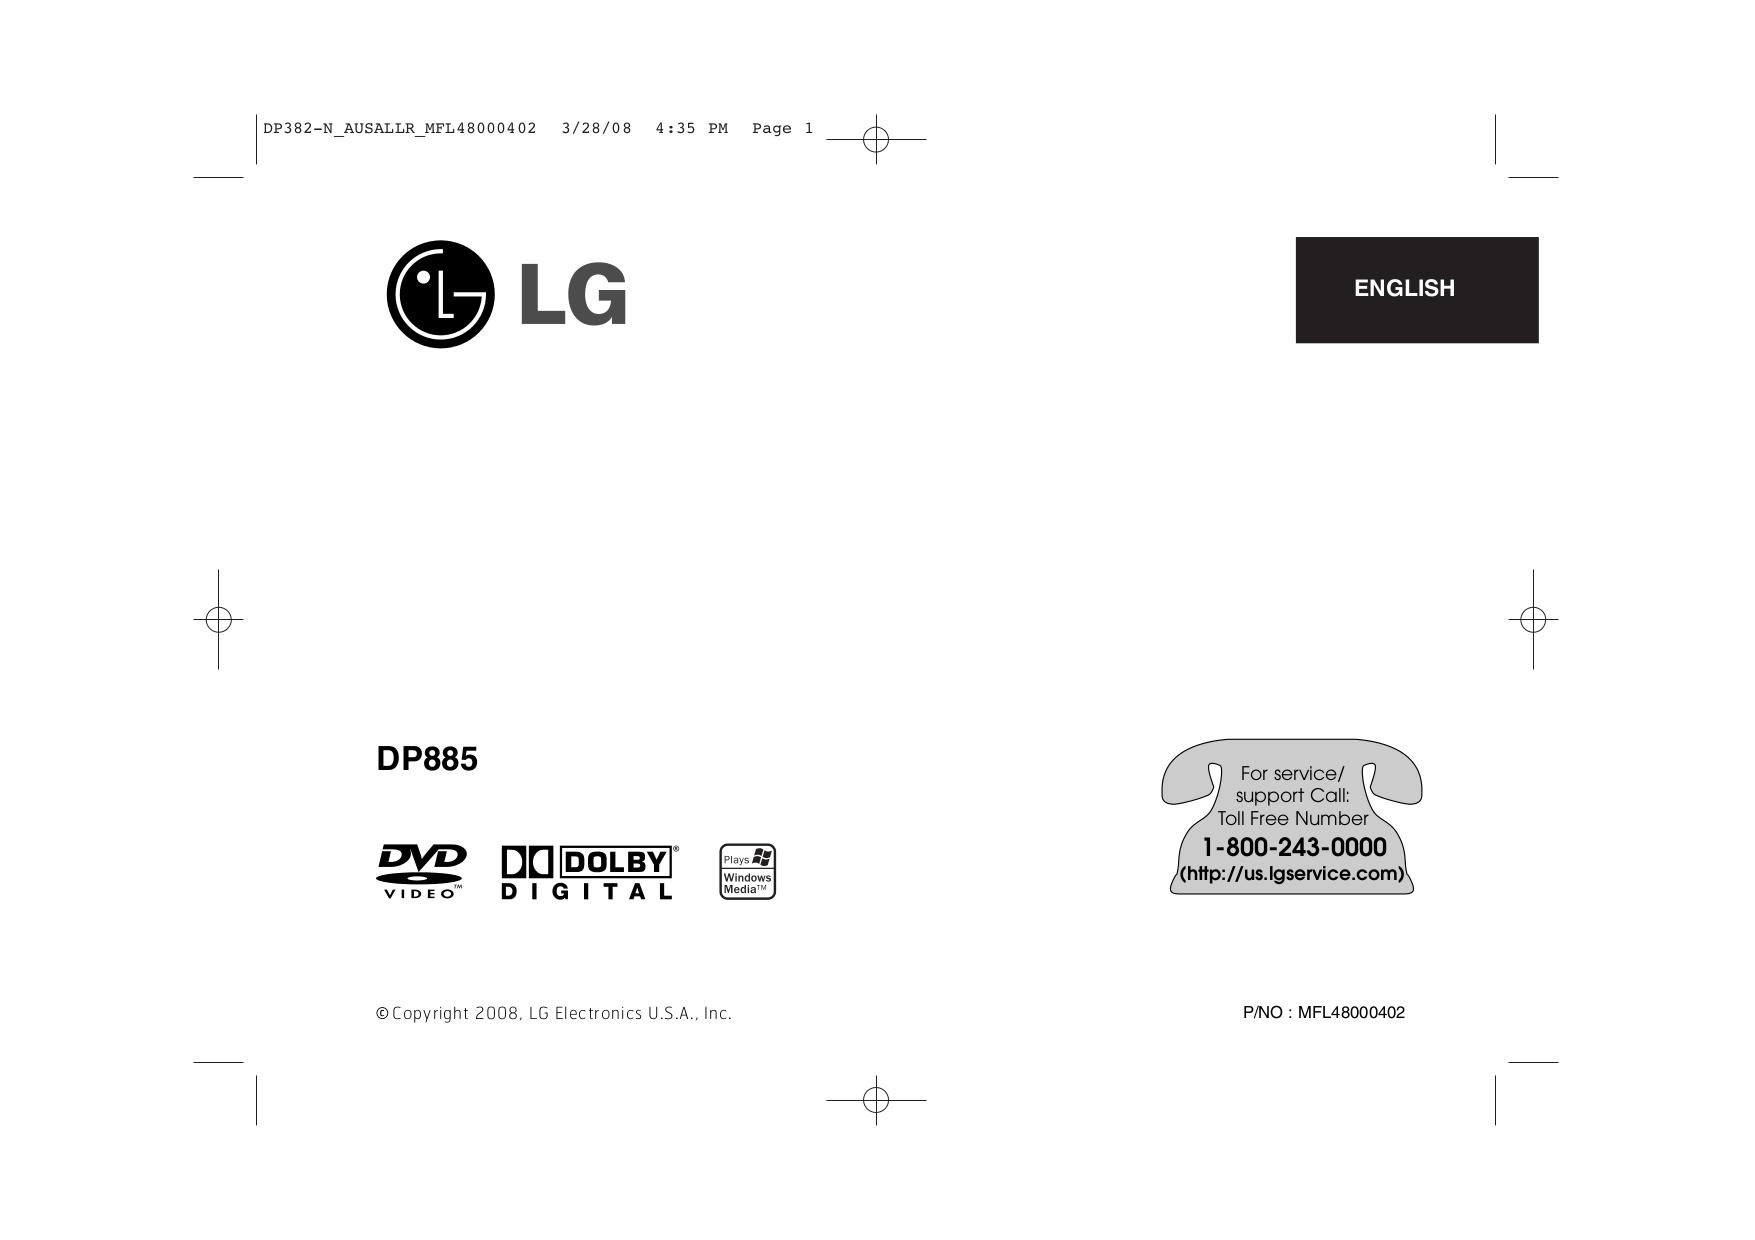 pdf for LG Portable DVD Player DP885 manual